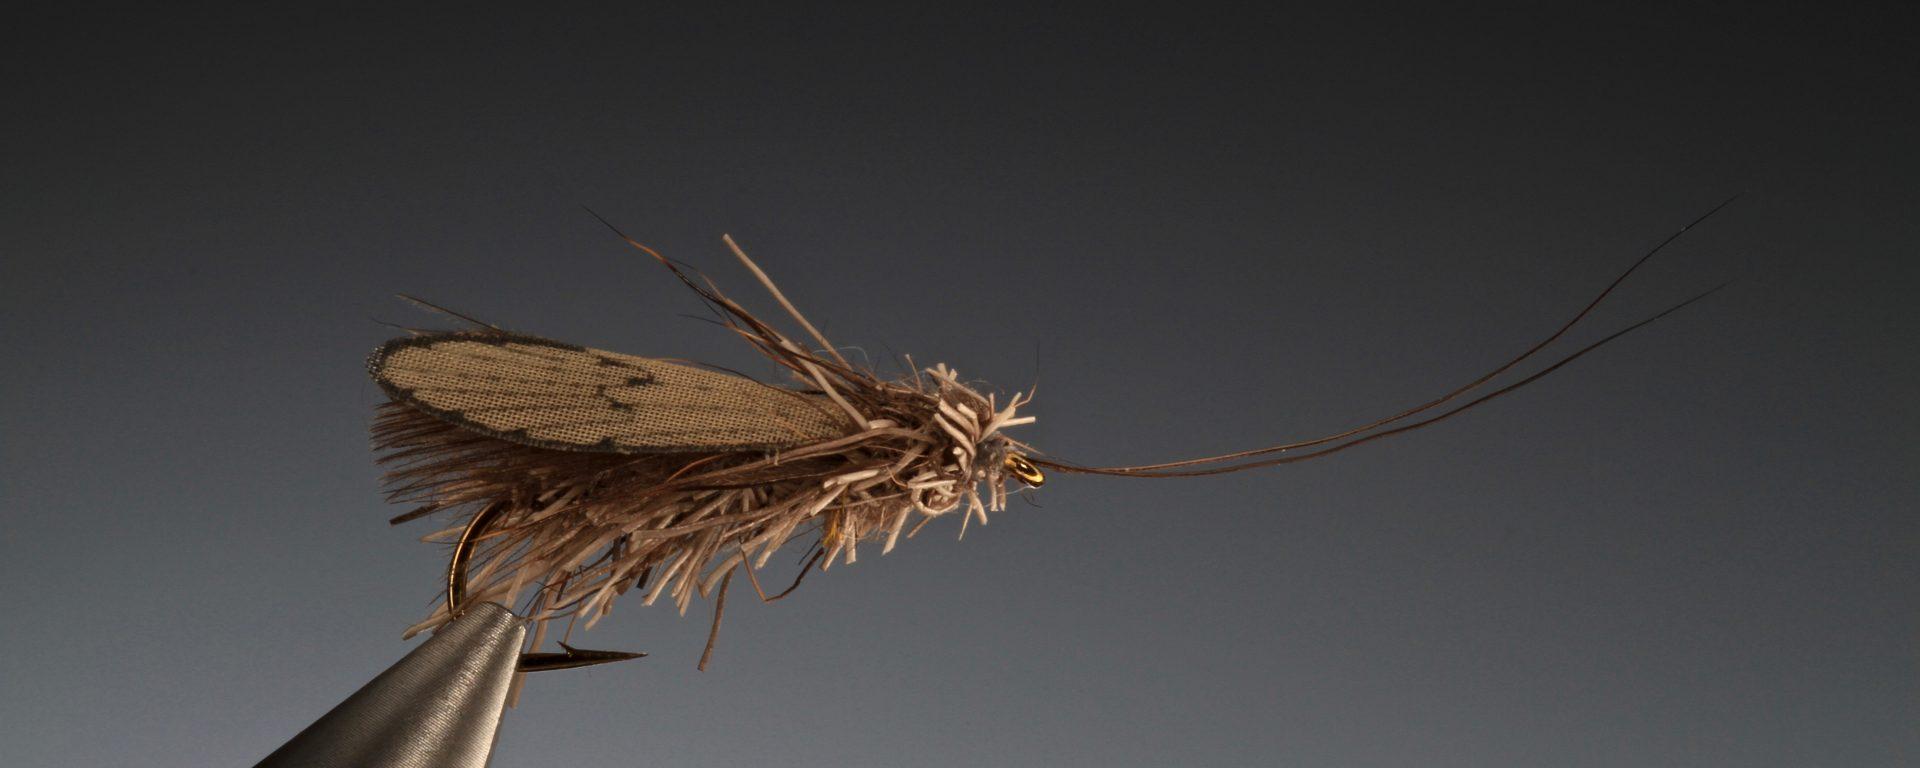 fly tying Wonder wing caddis